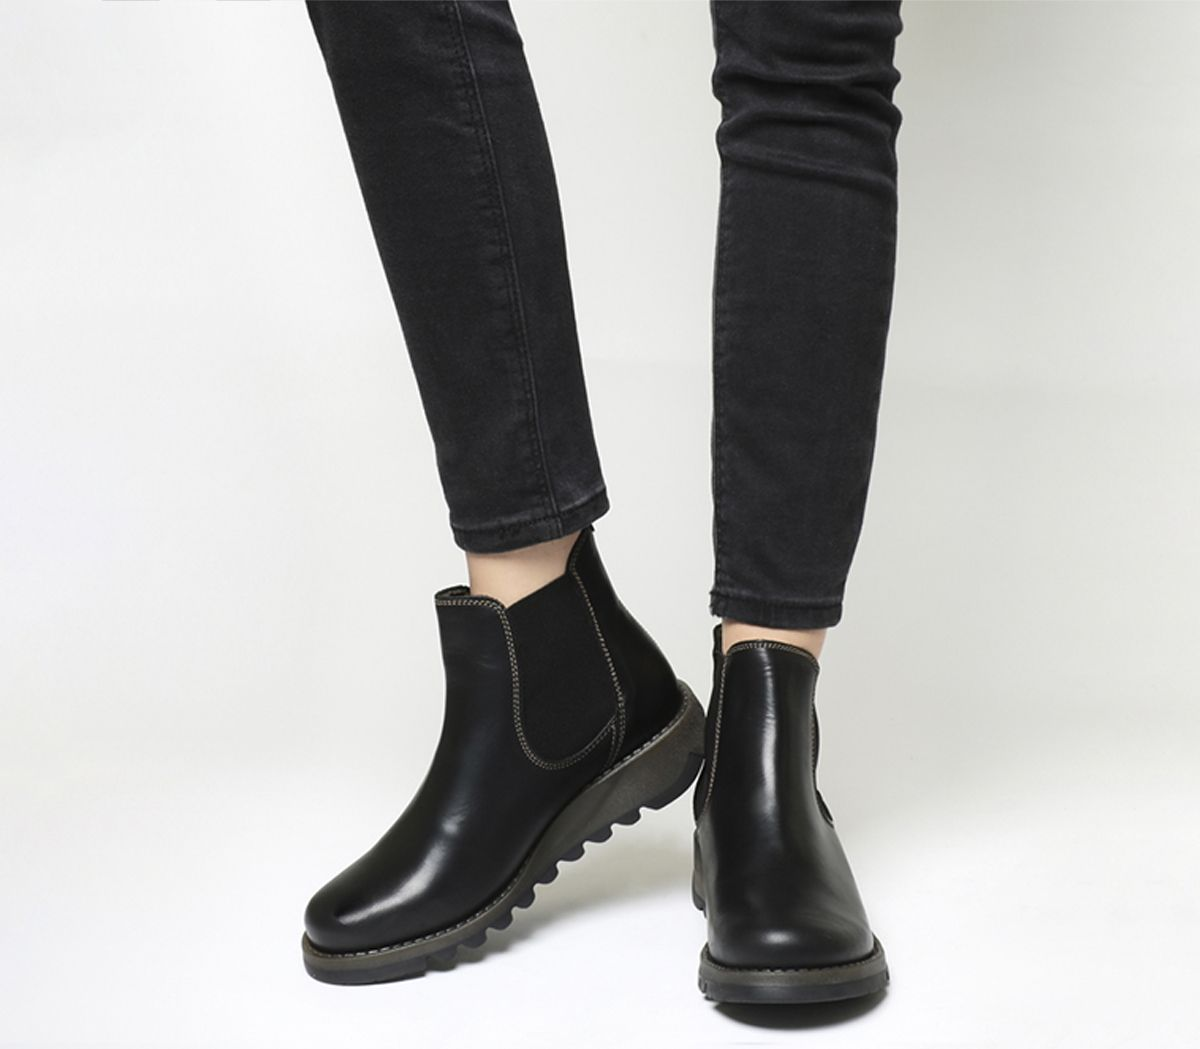 de2a823d80ce3 Fly London Salv Chelsea Boots Black Rug - Ankle Boots